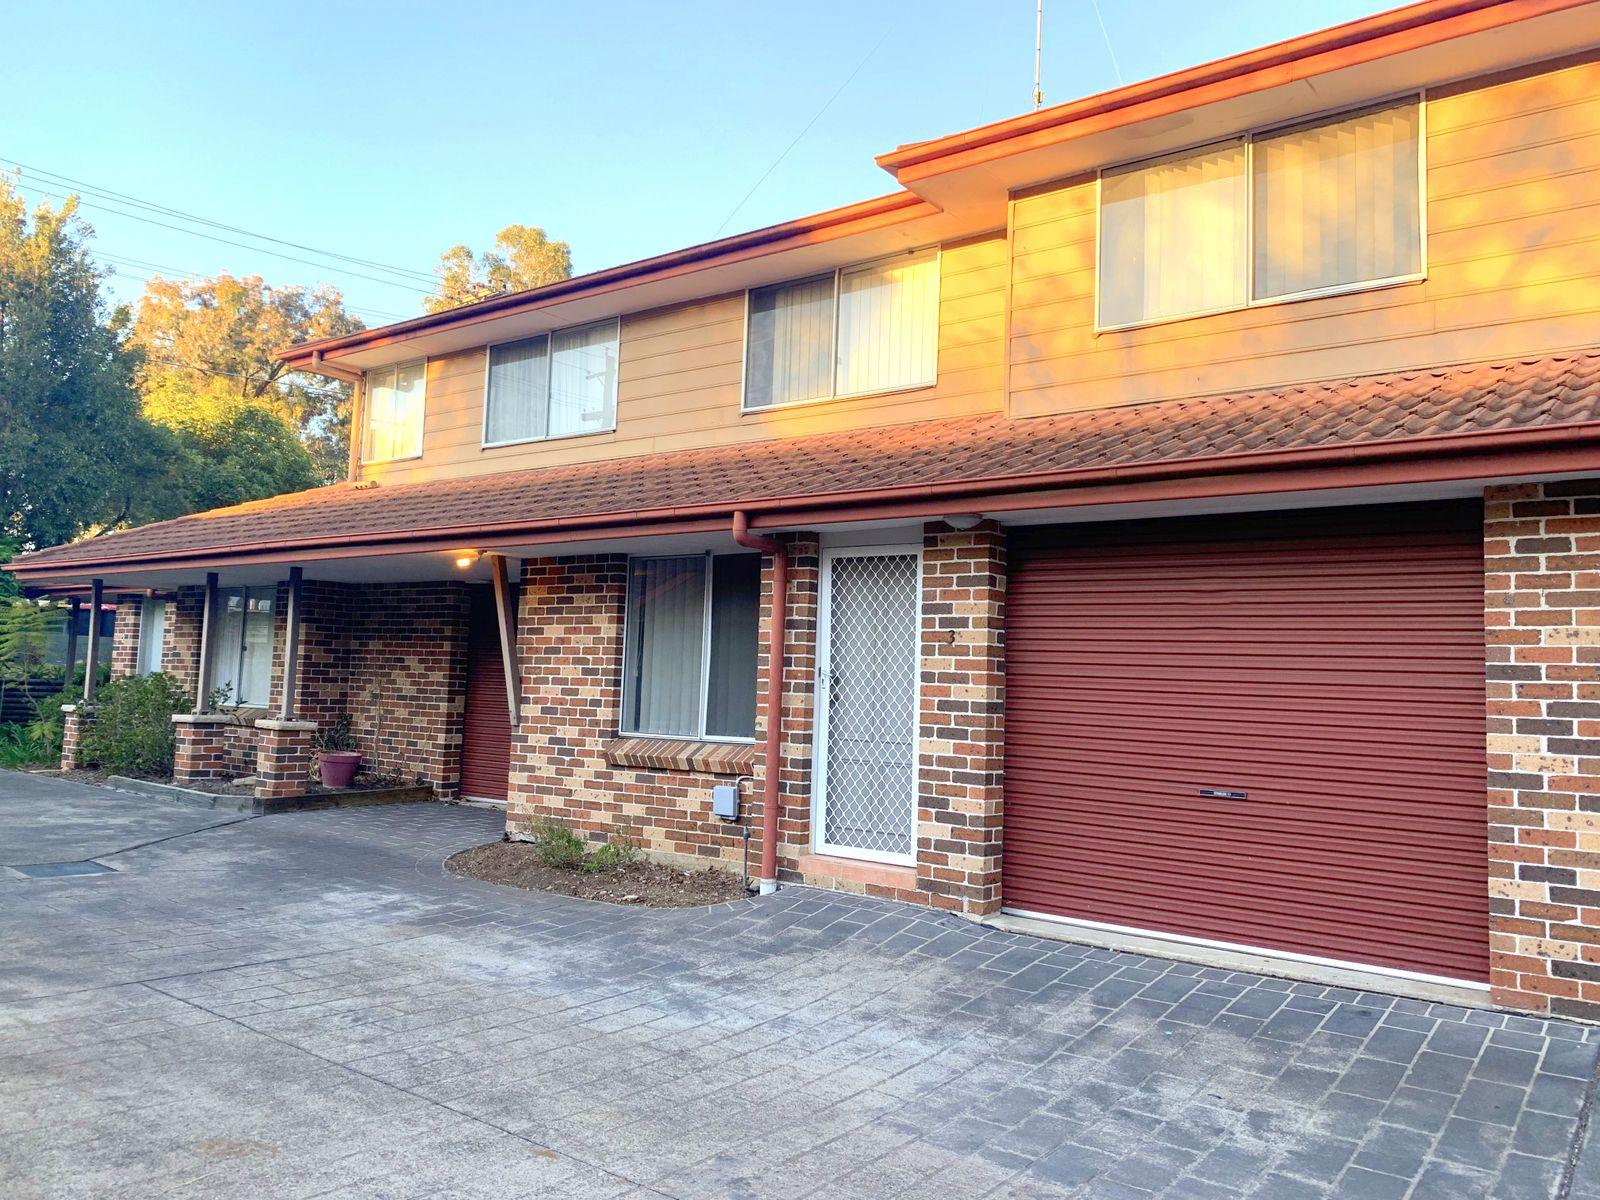 3/46-48 Lethbridge Street, Penrith, NSW 2750